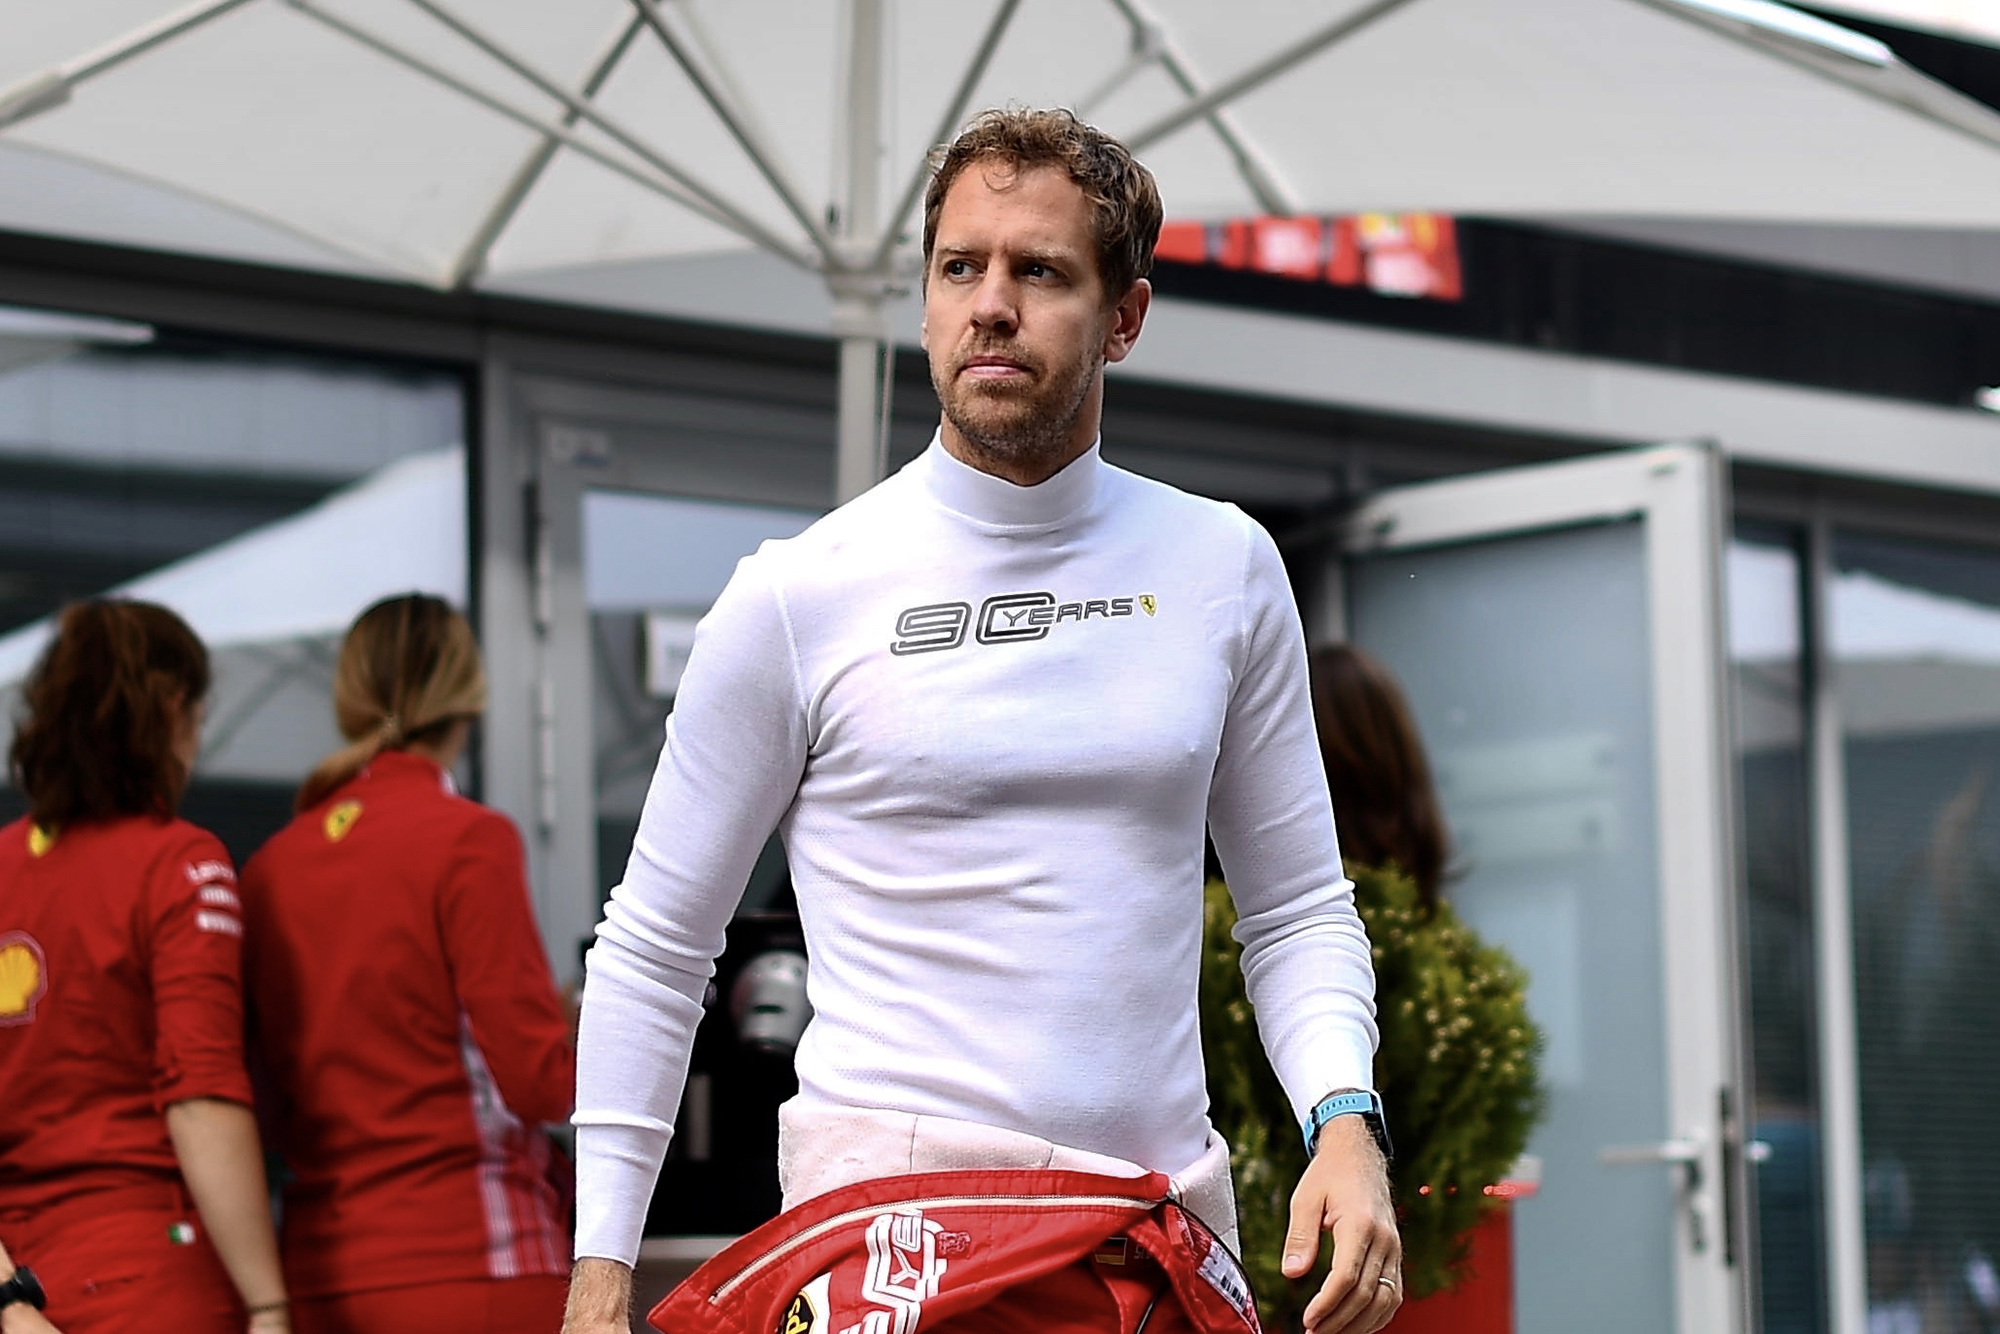 Sebastian Vettel in the paddock during the 2019 Russian Grand Prix